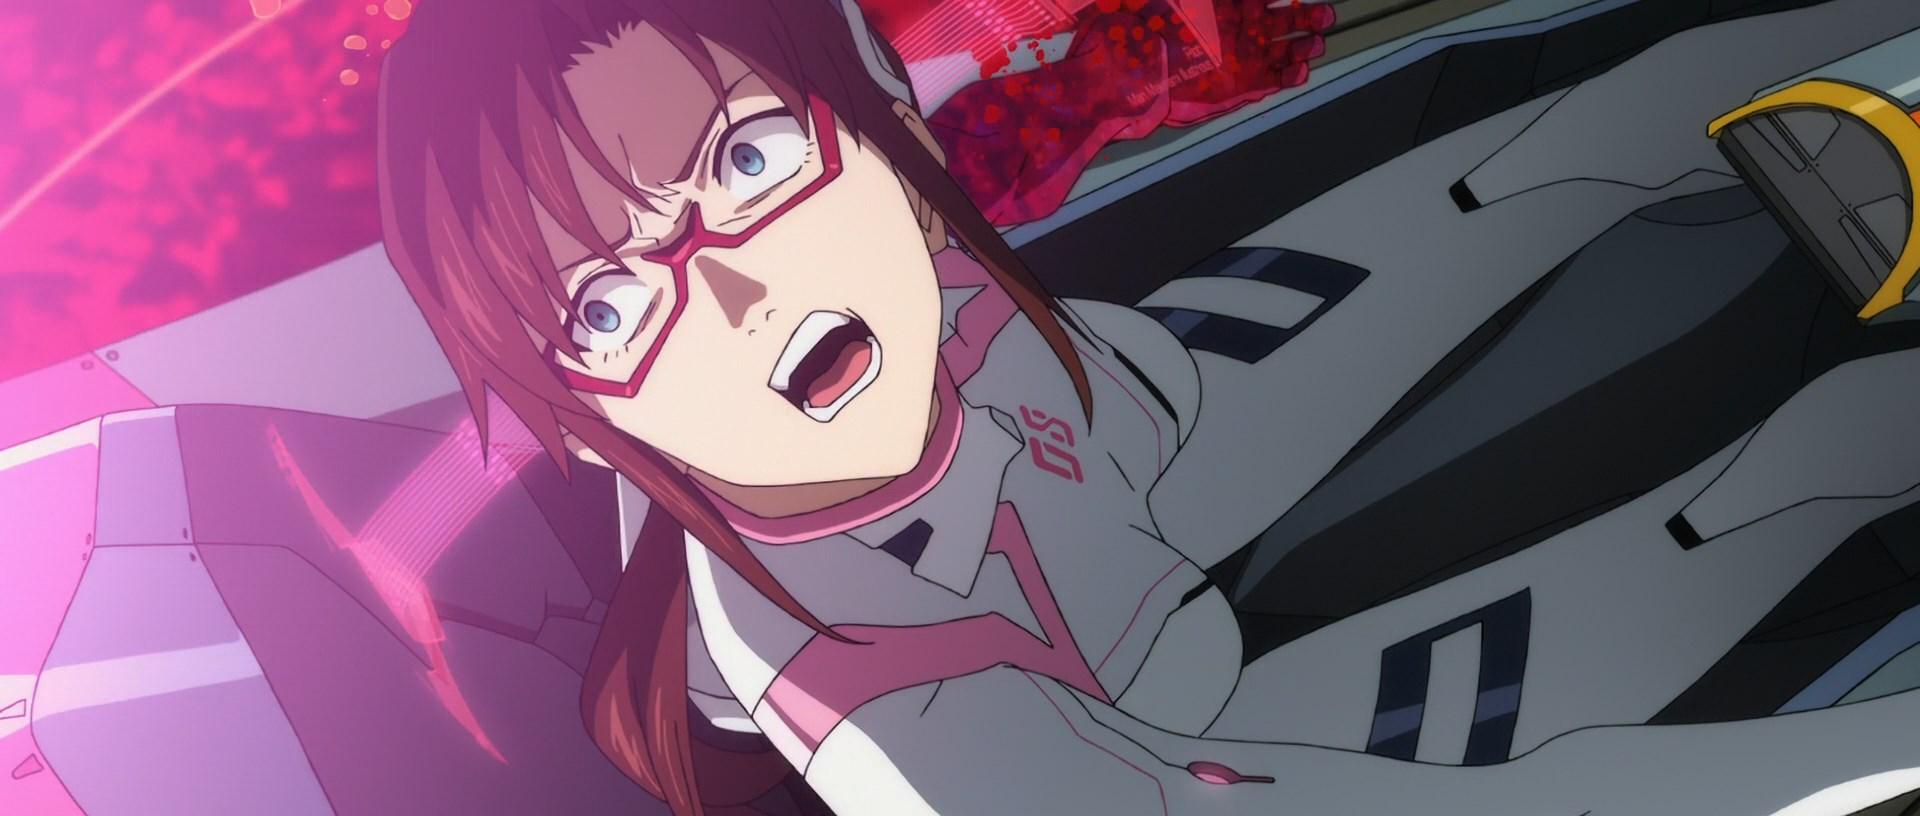 Evangelion 3.0+1.01 Thrice Upon a Time [UA MAX] 1080p Ukr.Jap1.mkv_snapshot_01.28.35.802.jpg